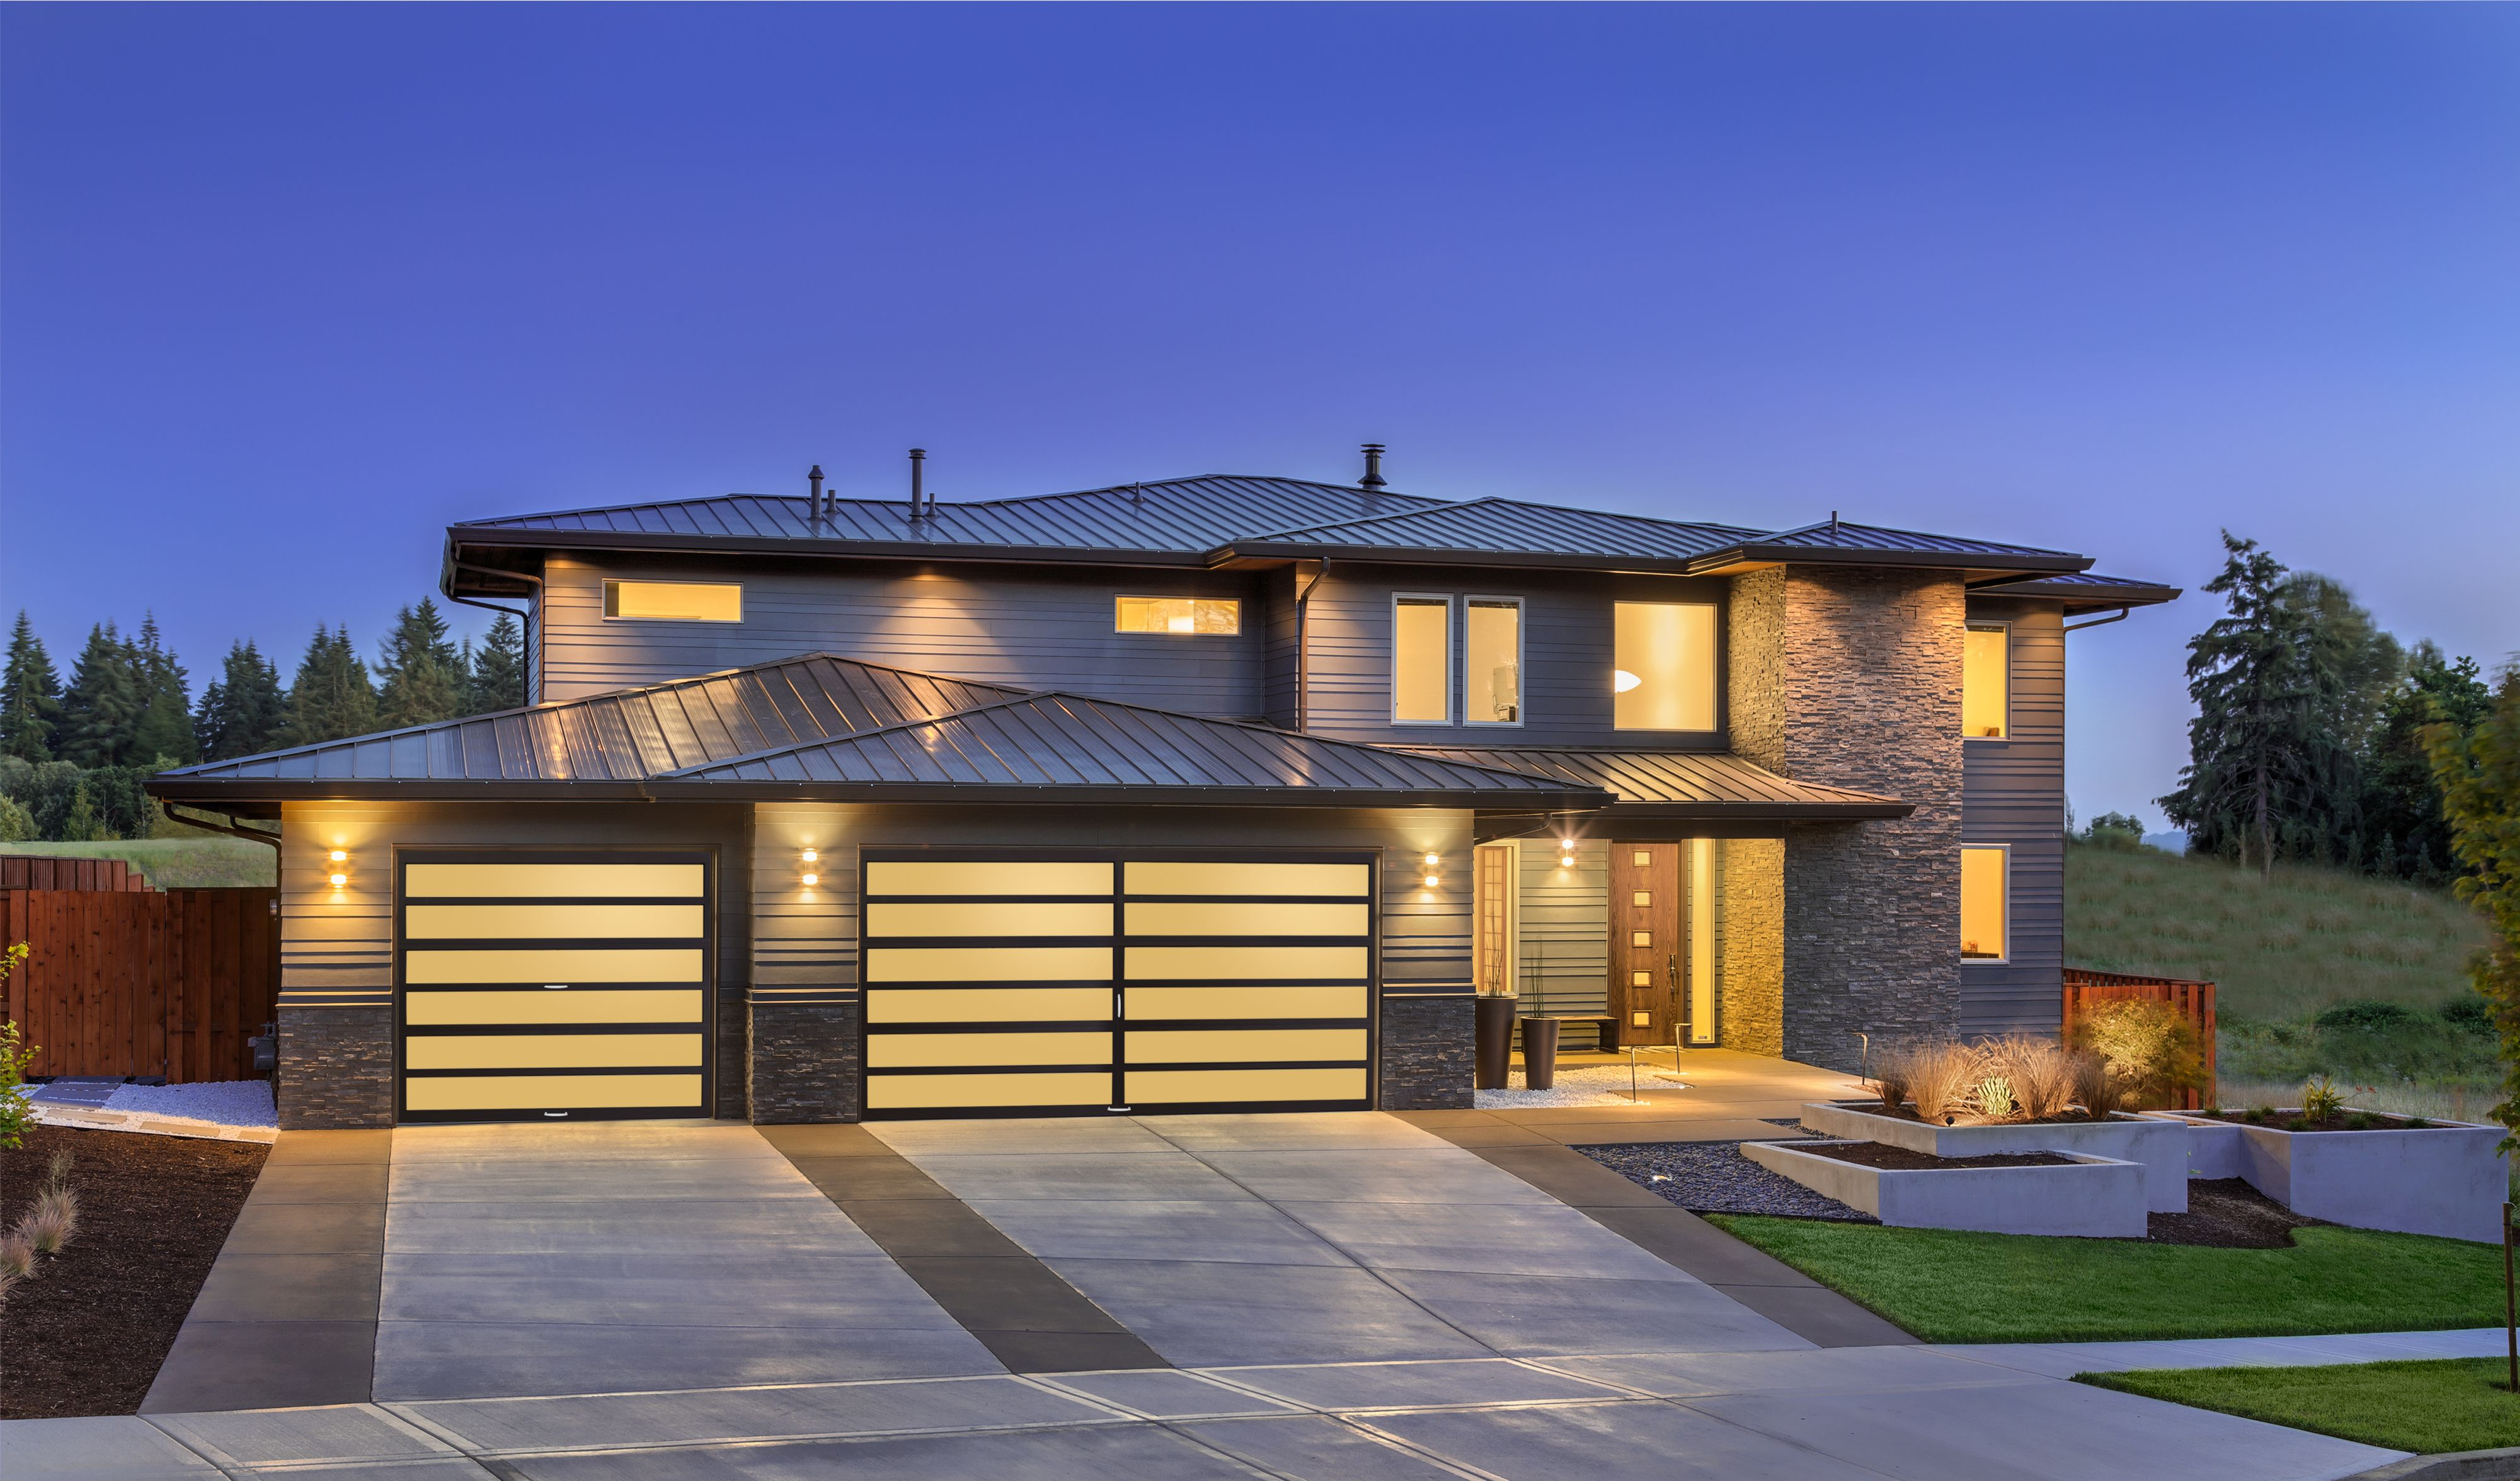 Amarr Horizon Ho1000 Contemporary Aluminum Multiview Garage Door